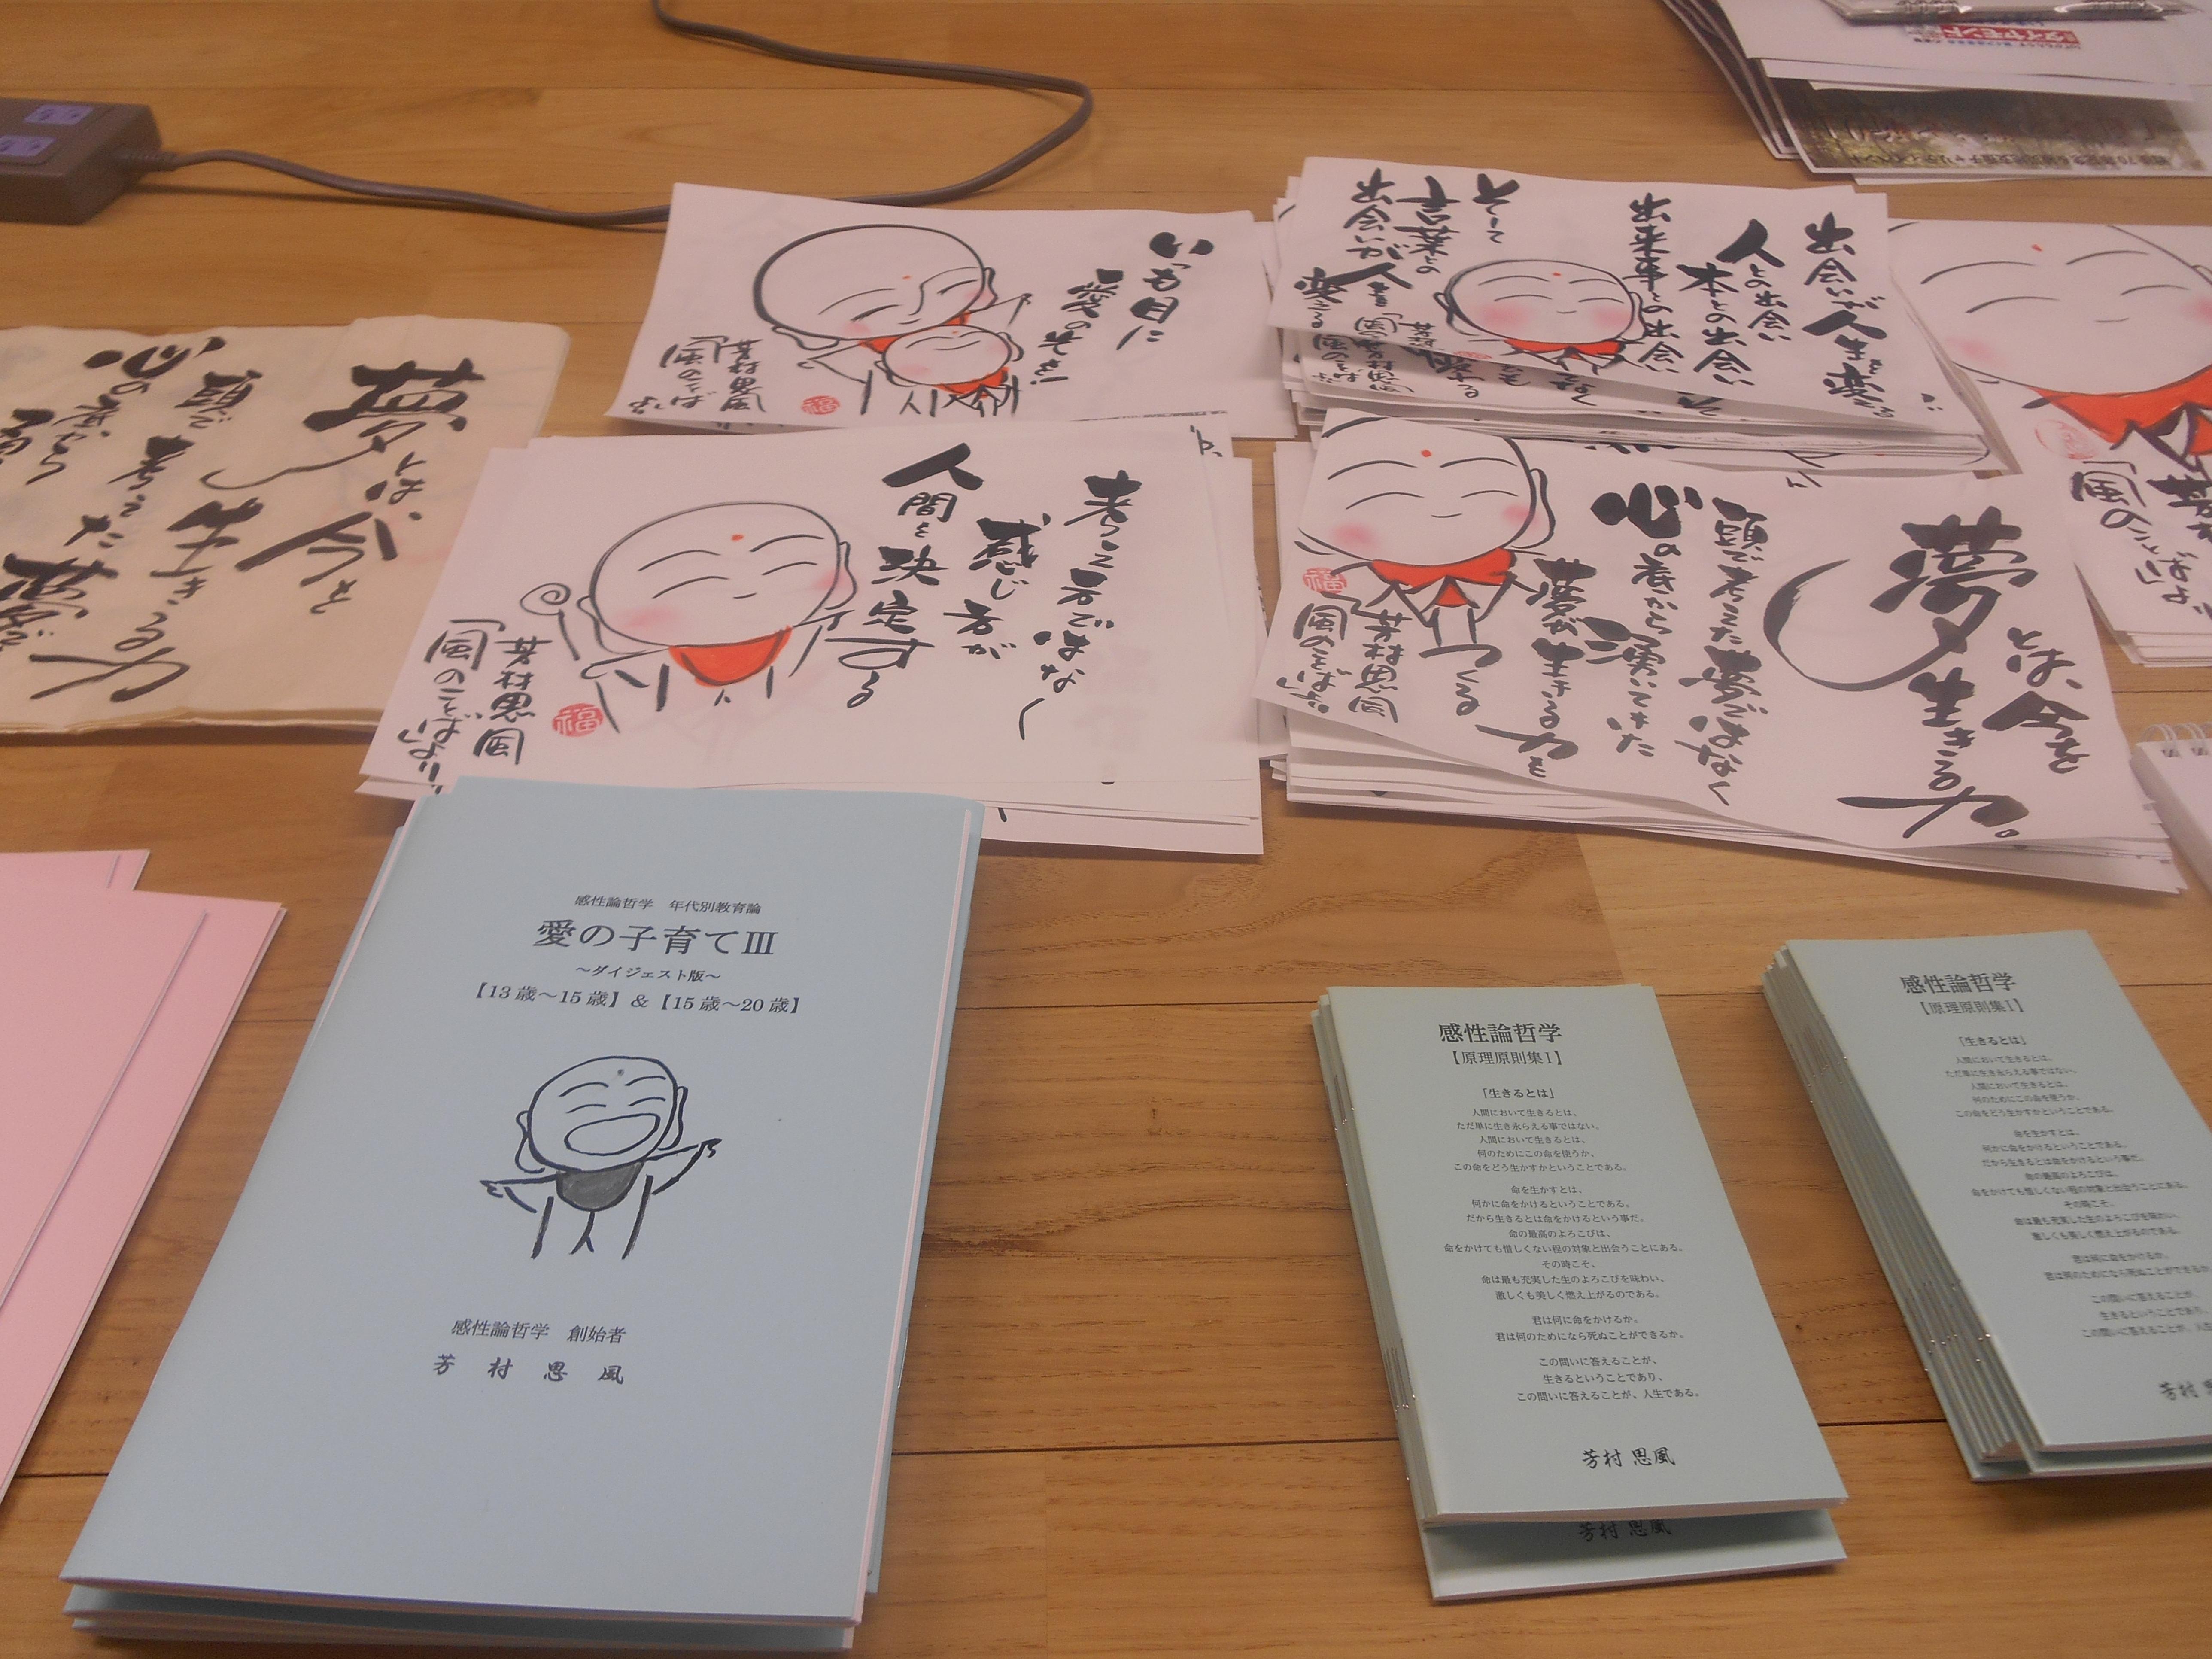 DSCN0414 - 2017年2月4日東京思風塾開催